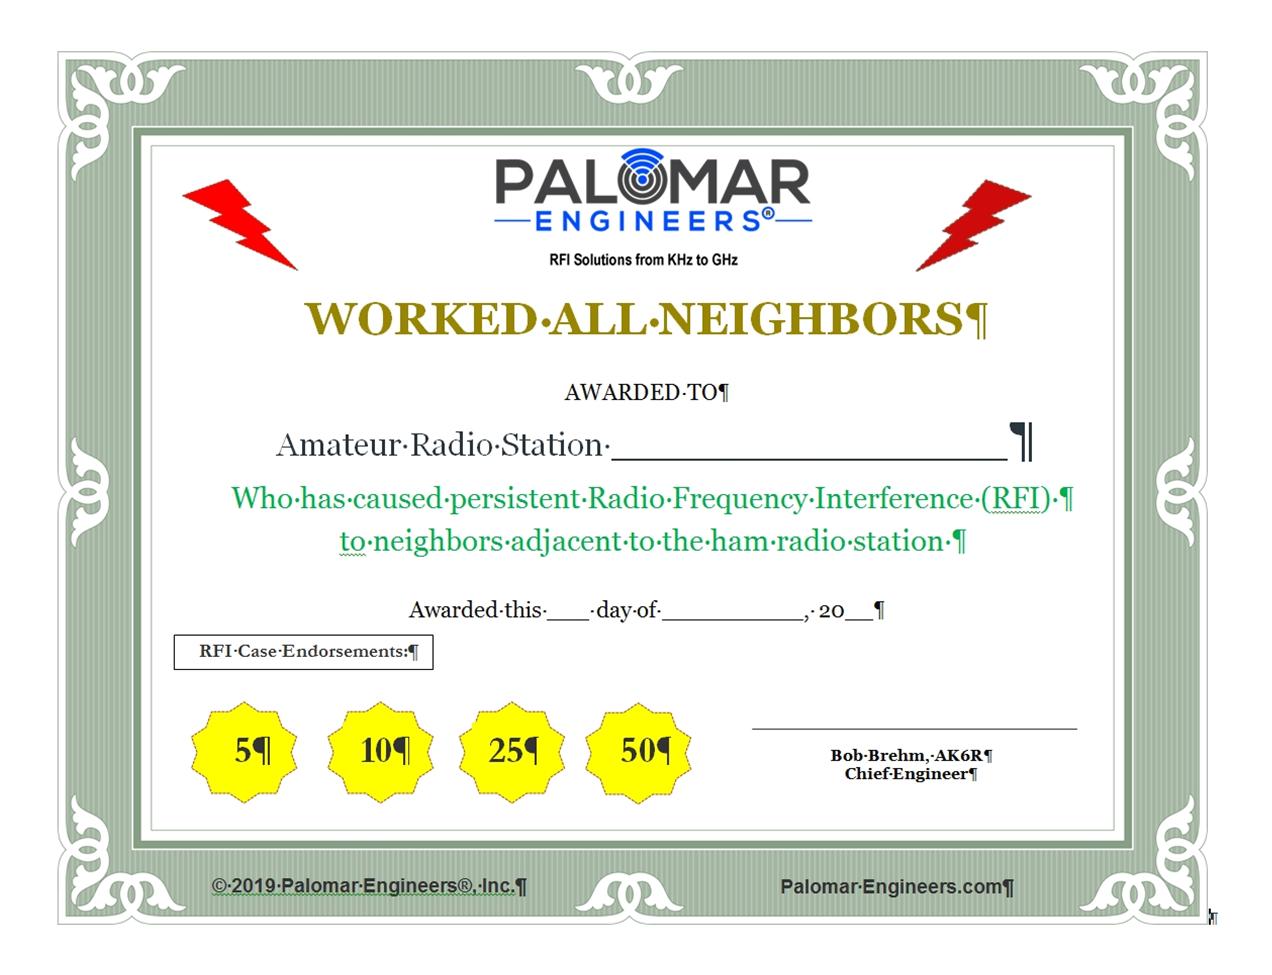 Work All Neighbors Award Certificate - Download WANA